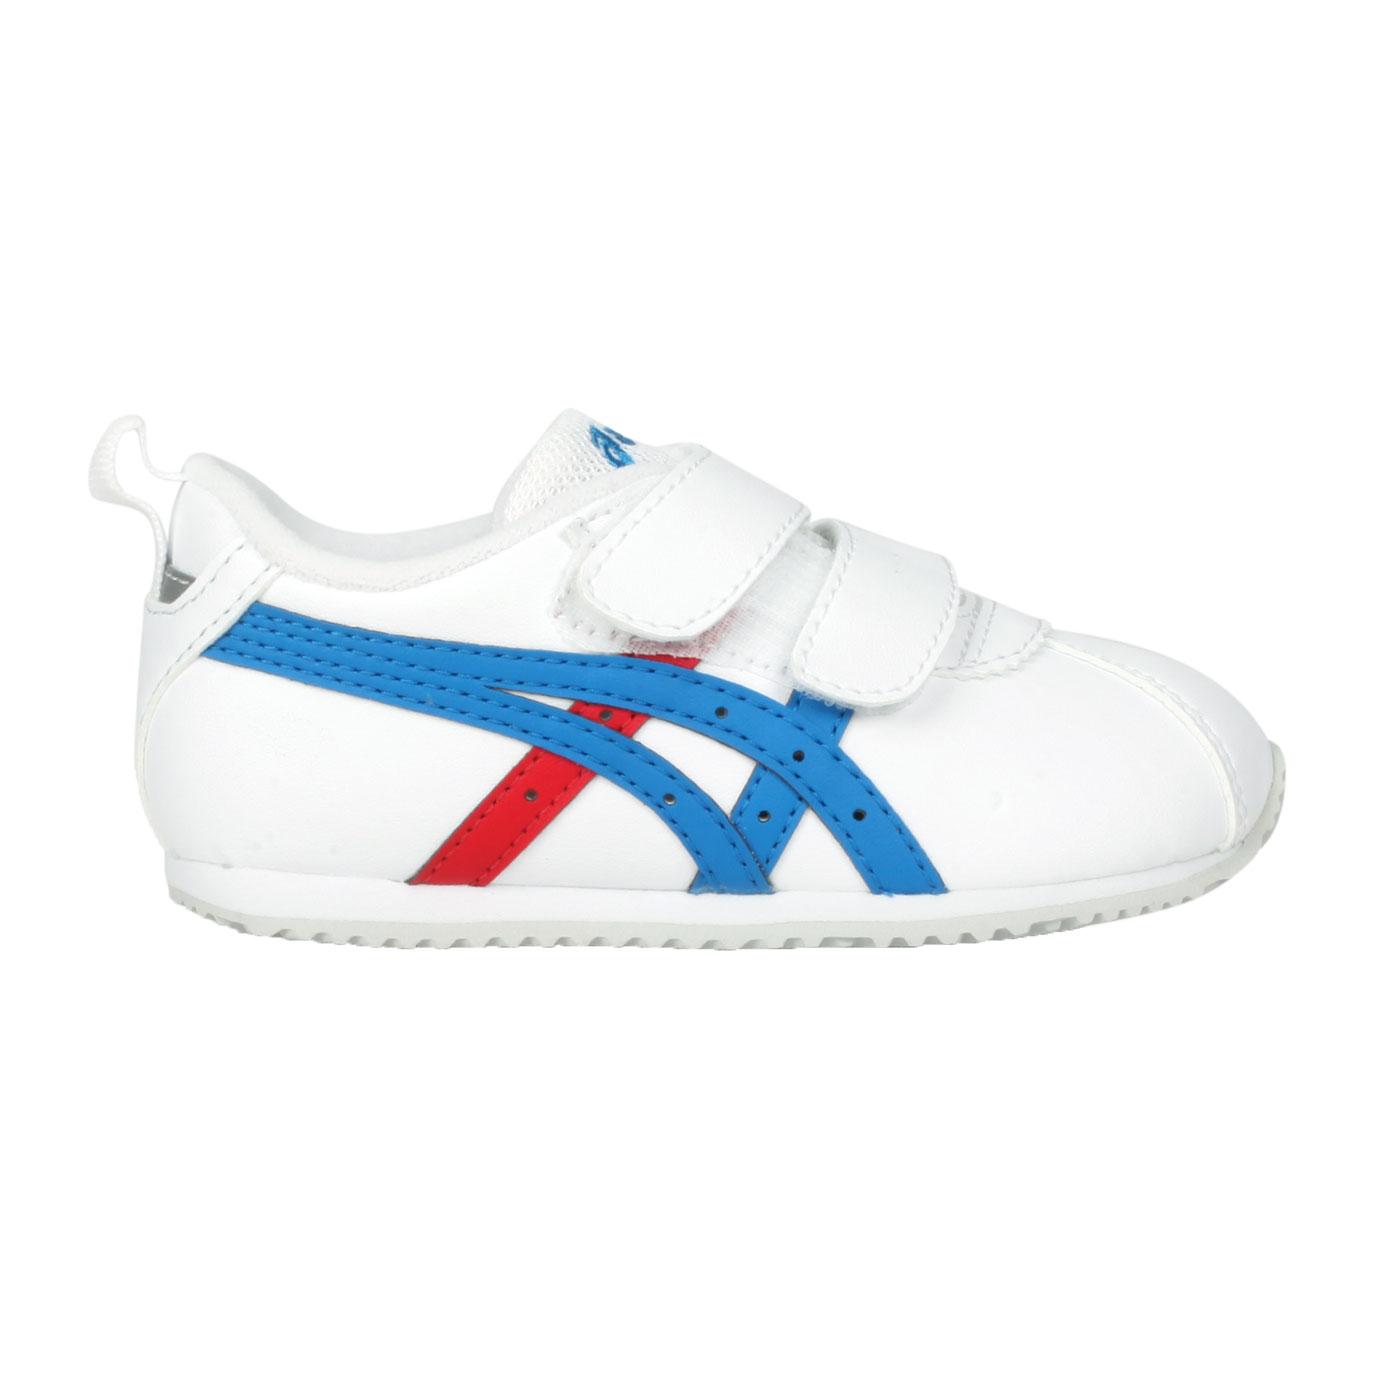 ASICS 小童運動休閒鞋  @CORSAIR BABY SL 2@1144A151-101 - 白藍紅